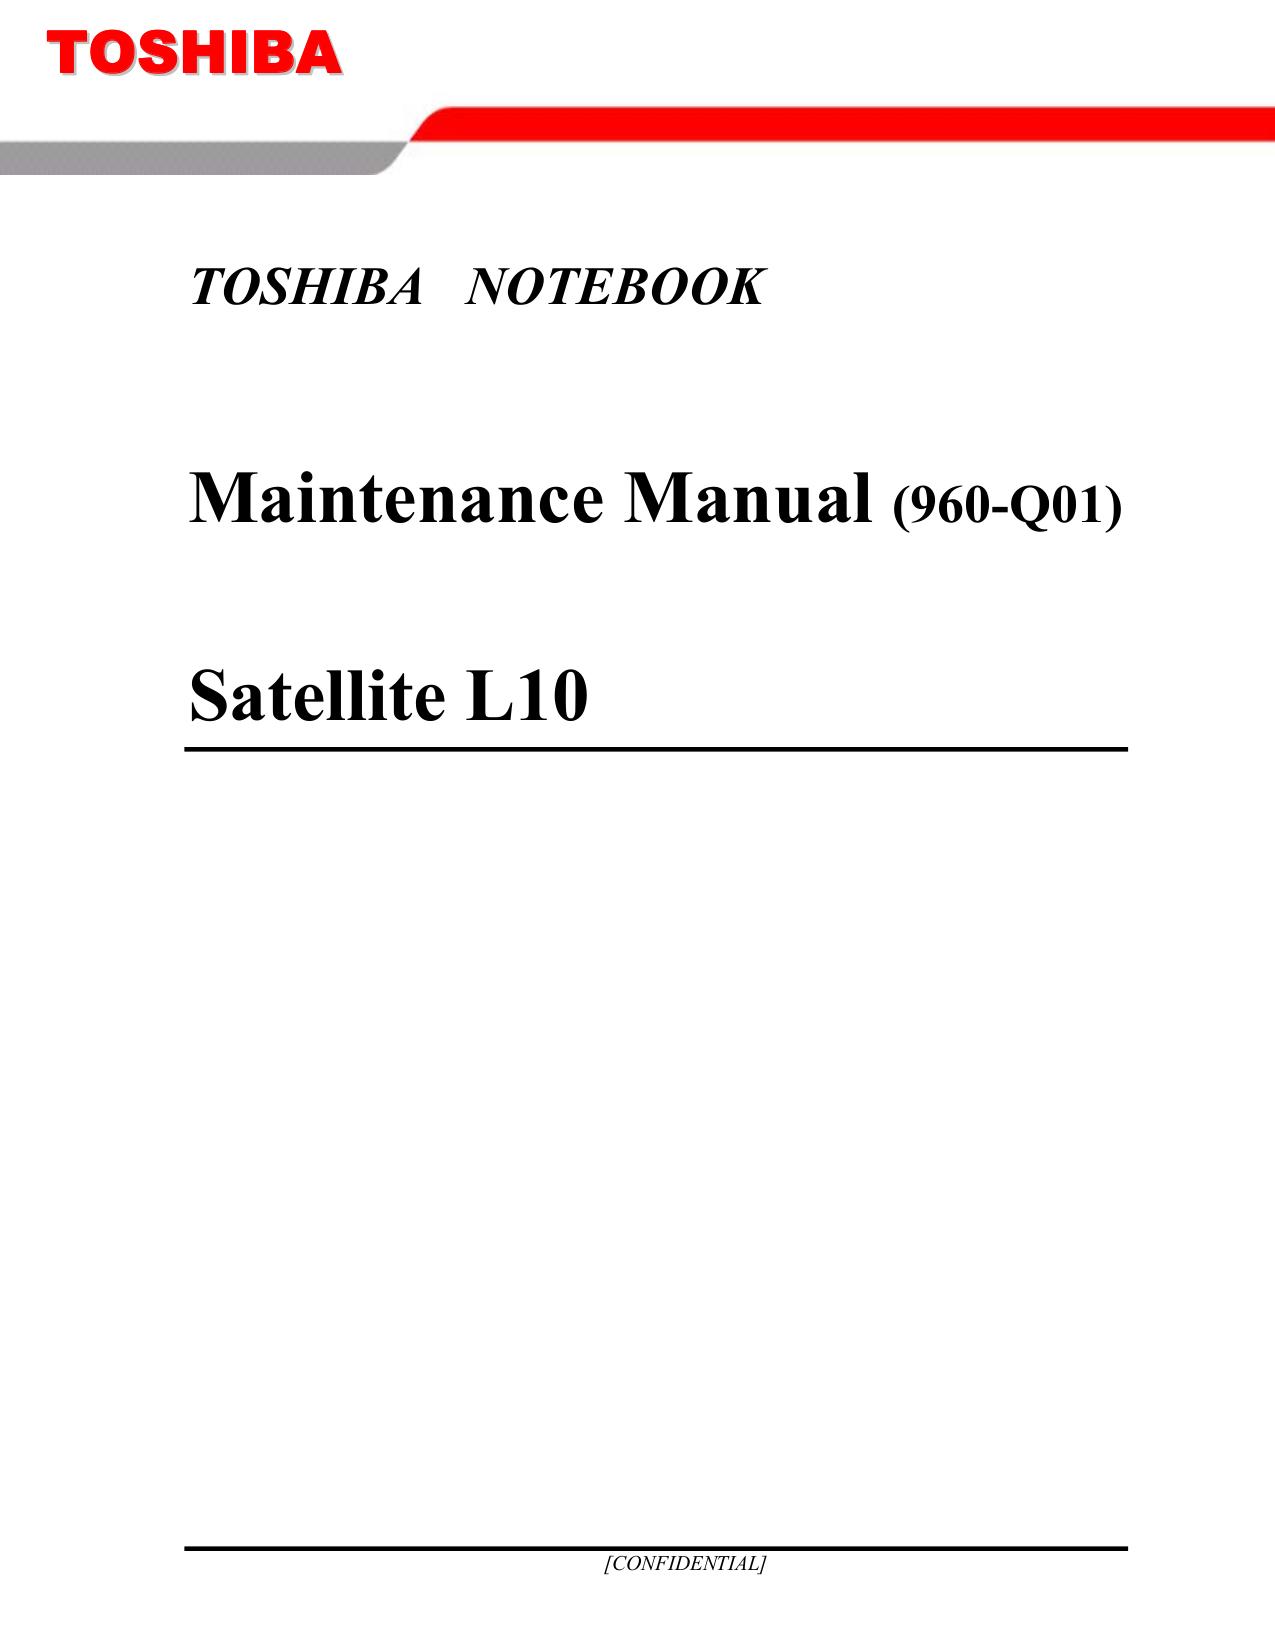 download free pdf for toshiba satellite l10 laptop manual rh umlib com toshiba satellite pro l10 service manual toshiba satellite pro l10 manual